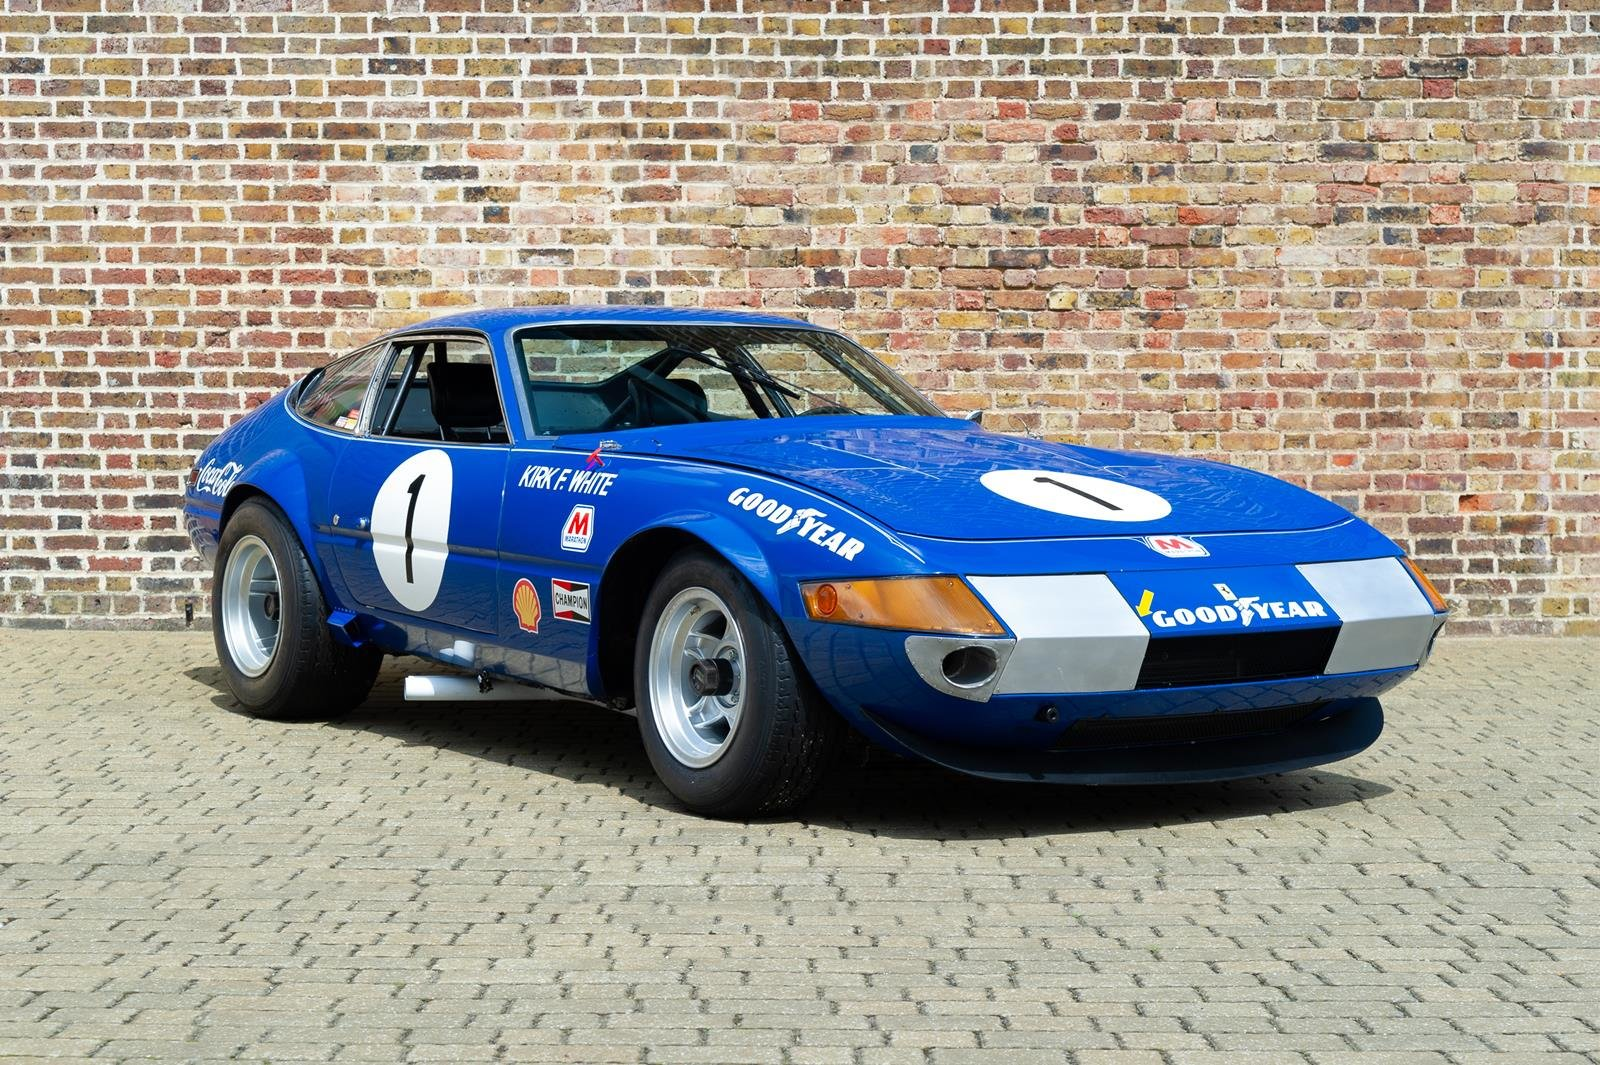 1972 Ferrari 365 GTB/4 Daytona Competizione For Sale | Car And Classic